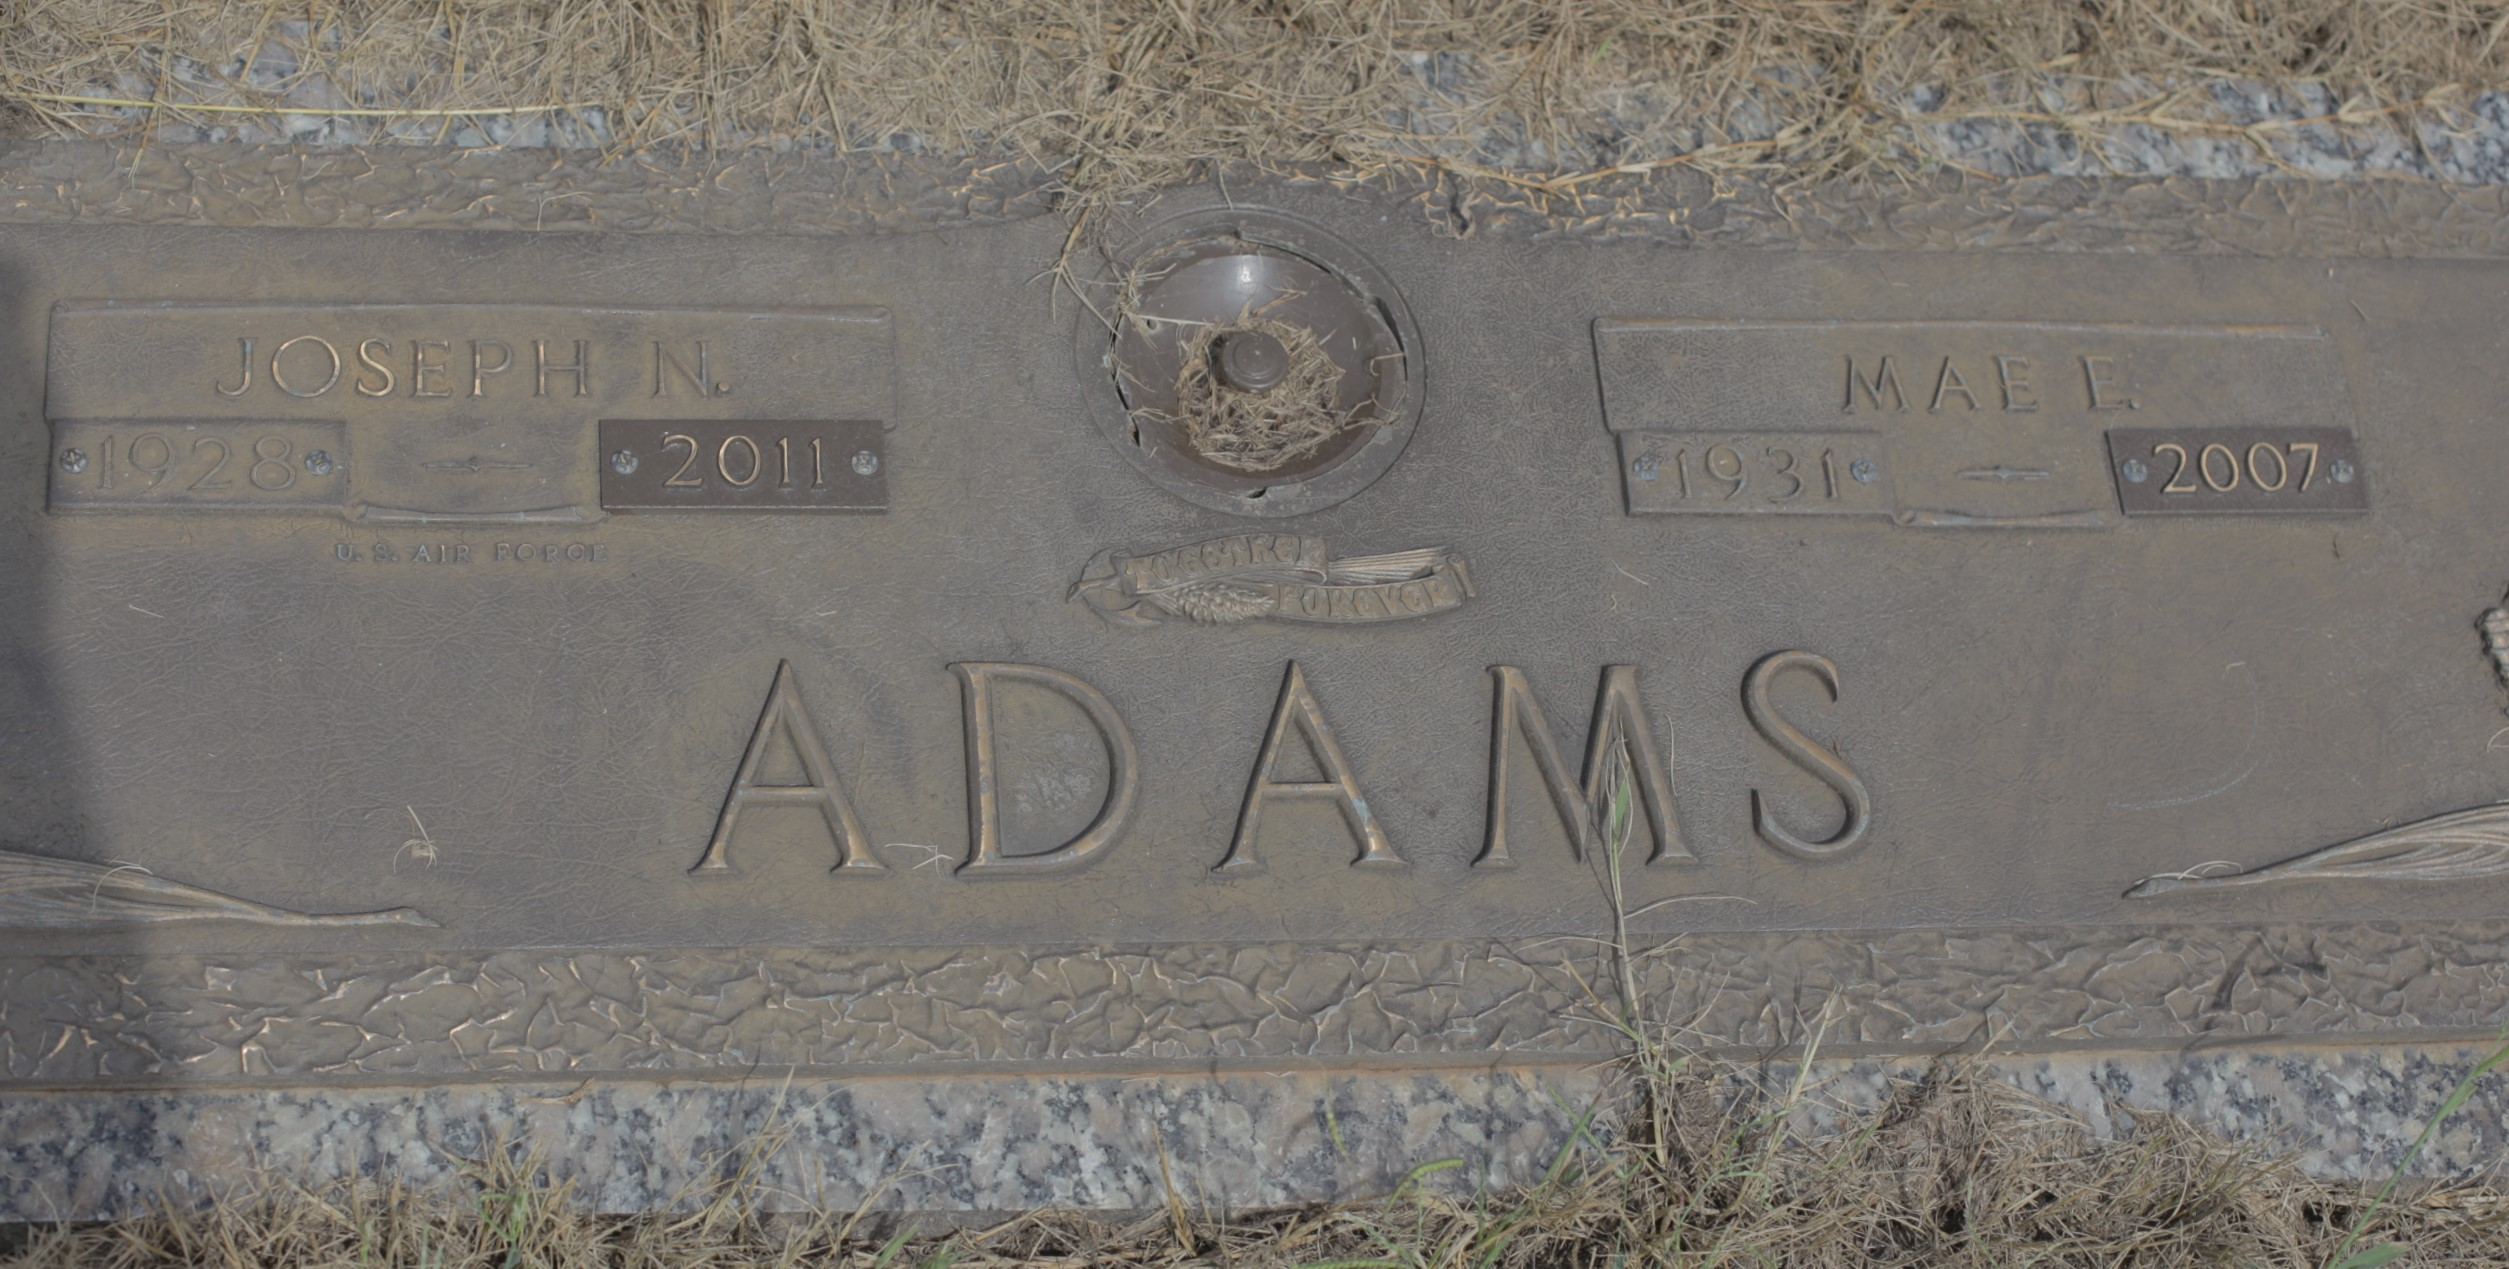 Joseph Nimrod Adams